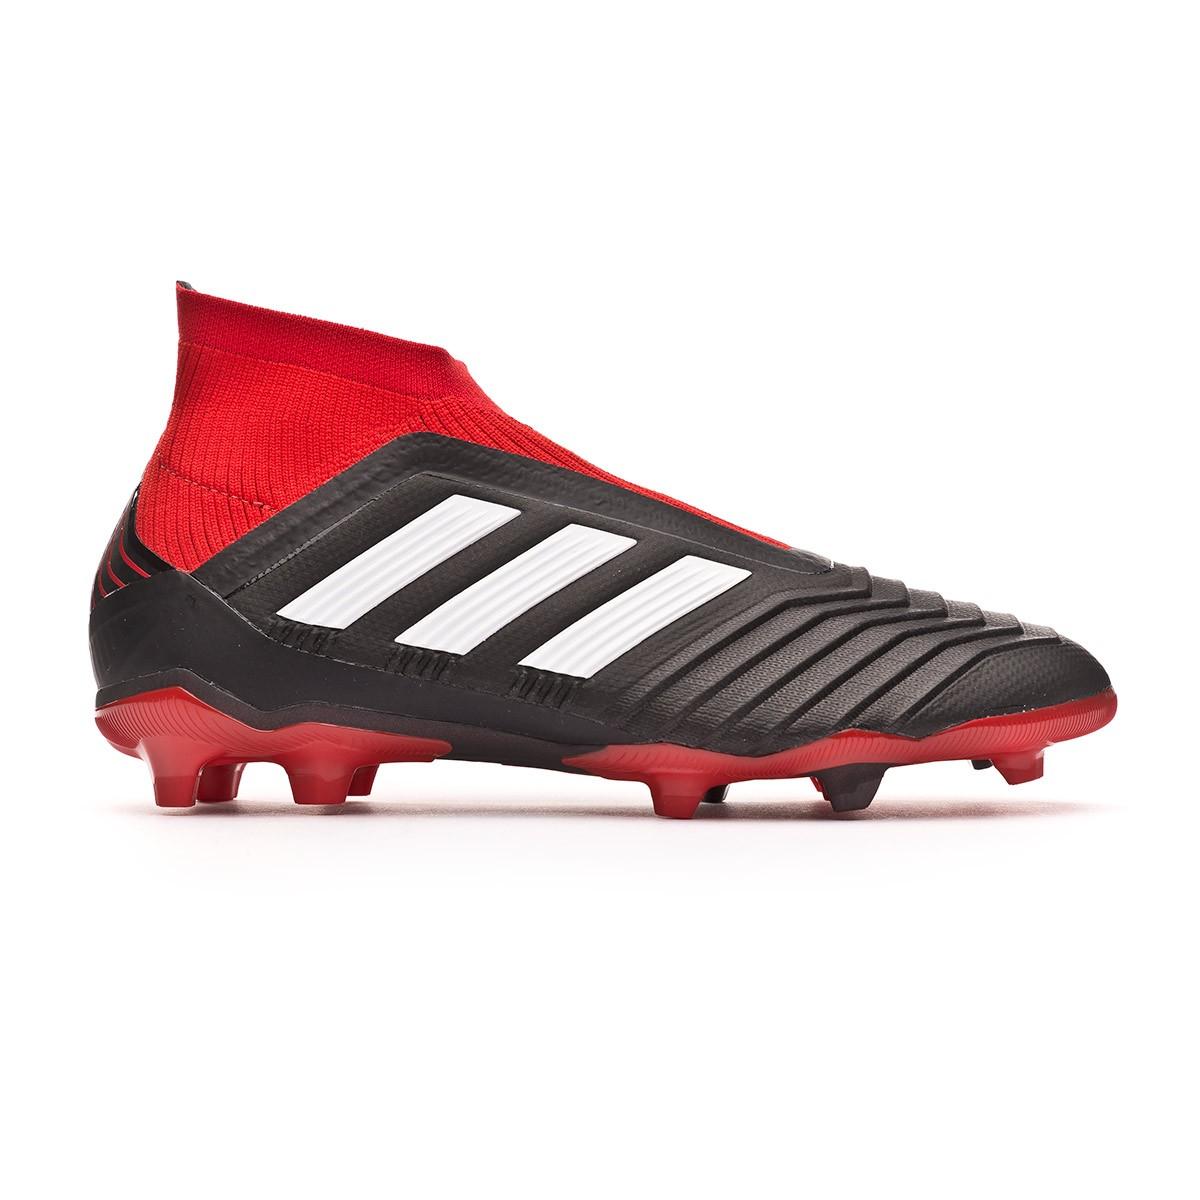 huge discount 3aea4 f9031 Bota de fútbol adidas Predator 18+ FG Niño Core black-White-Red - Leaked  soccer